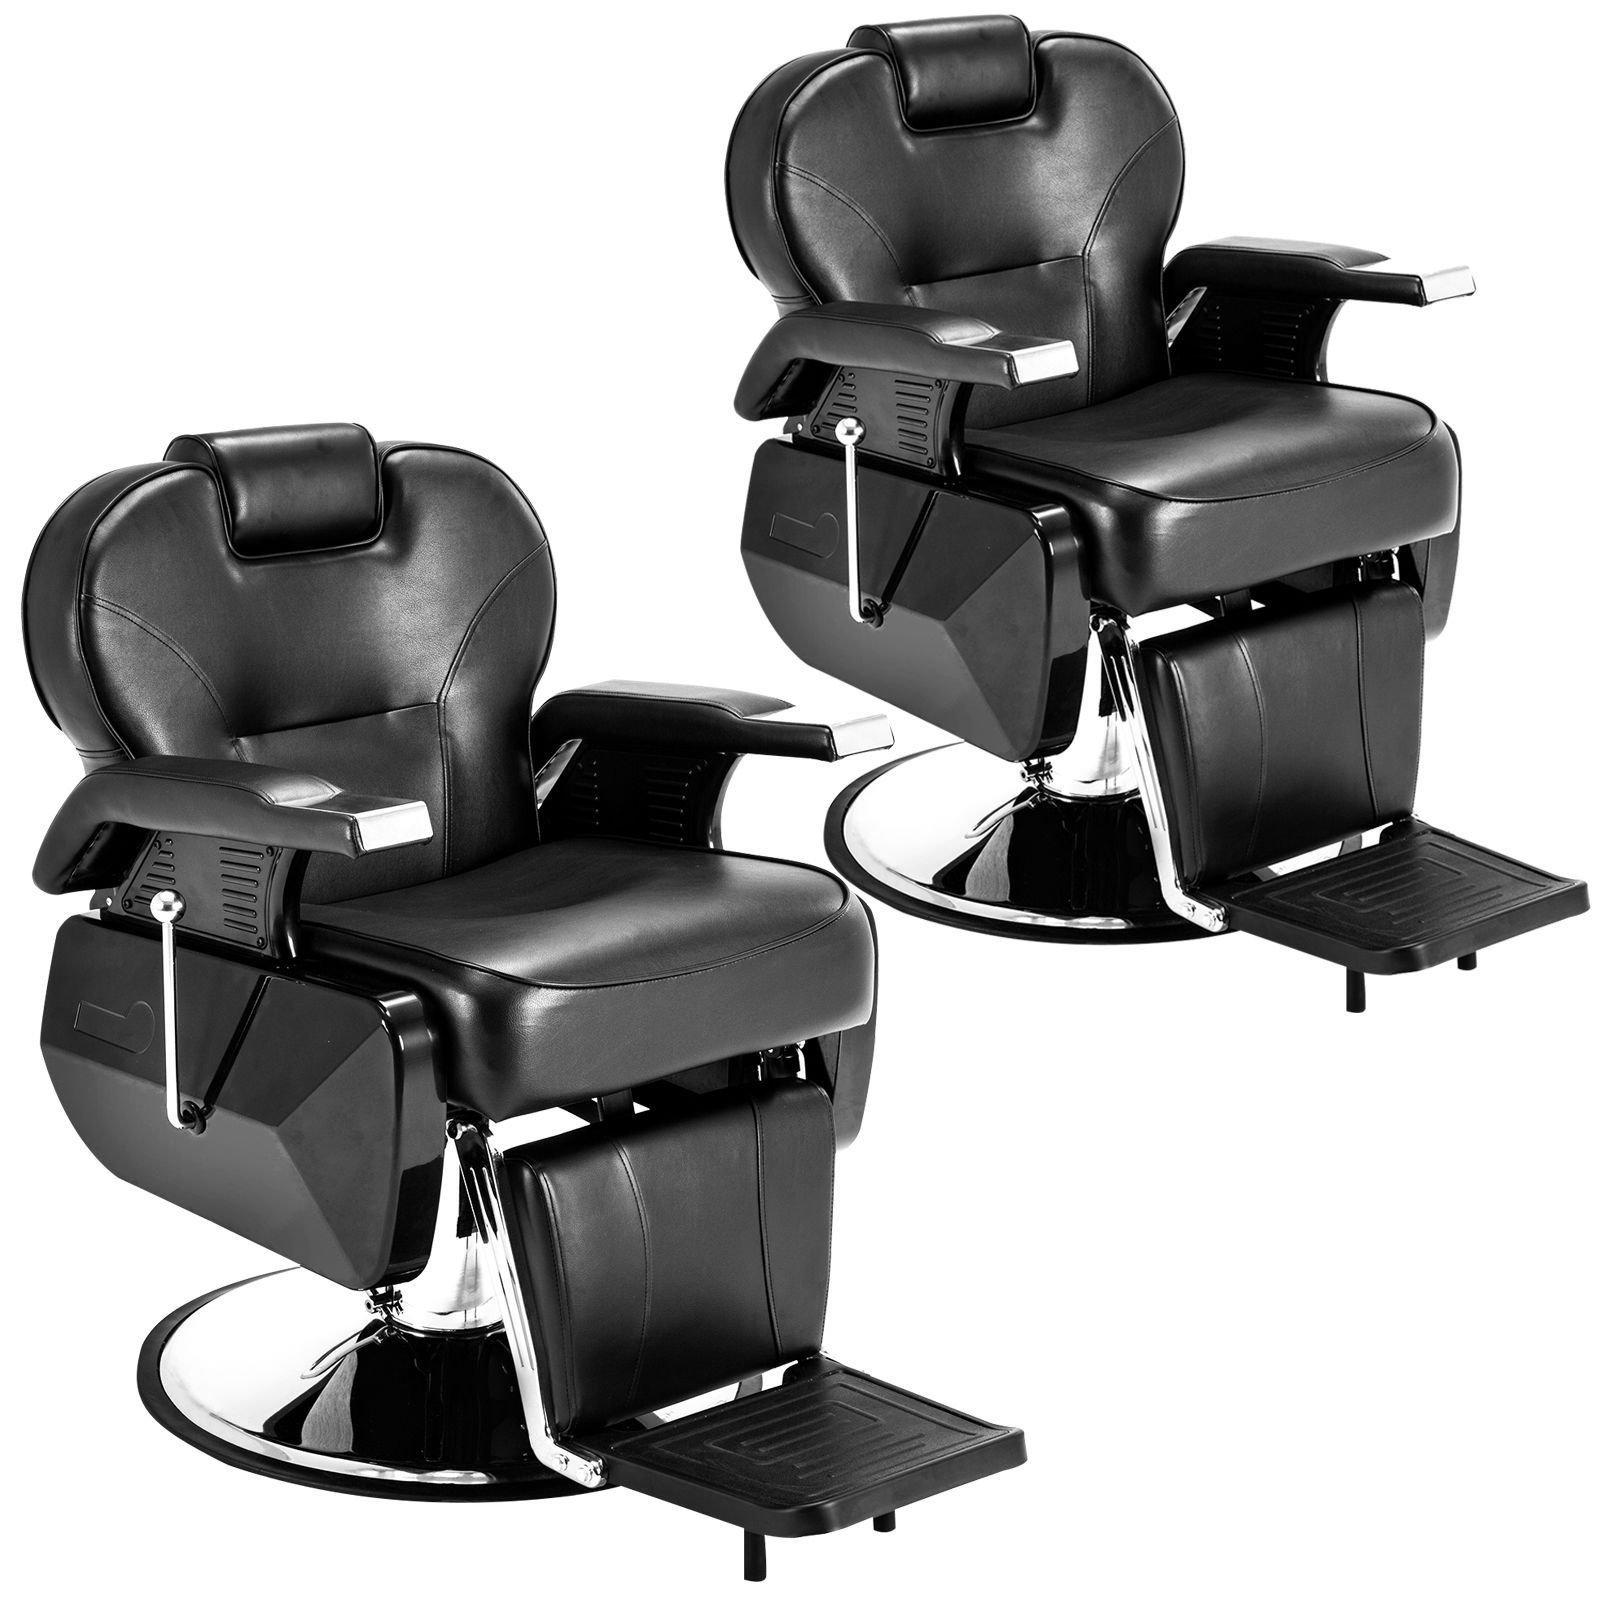 Set of 2 Black All Purpose Hydraulic Recline Barber Chair Salon Beauty Spa Shampoo StylingChair